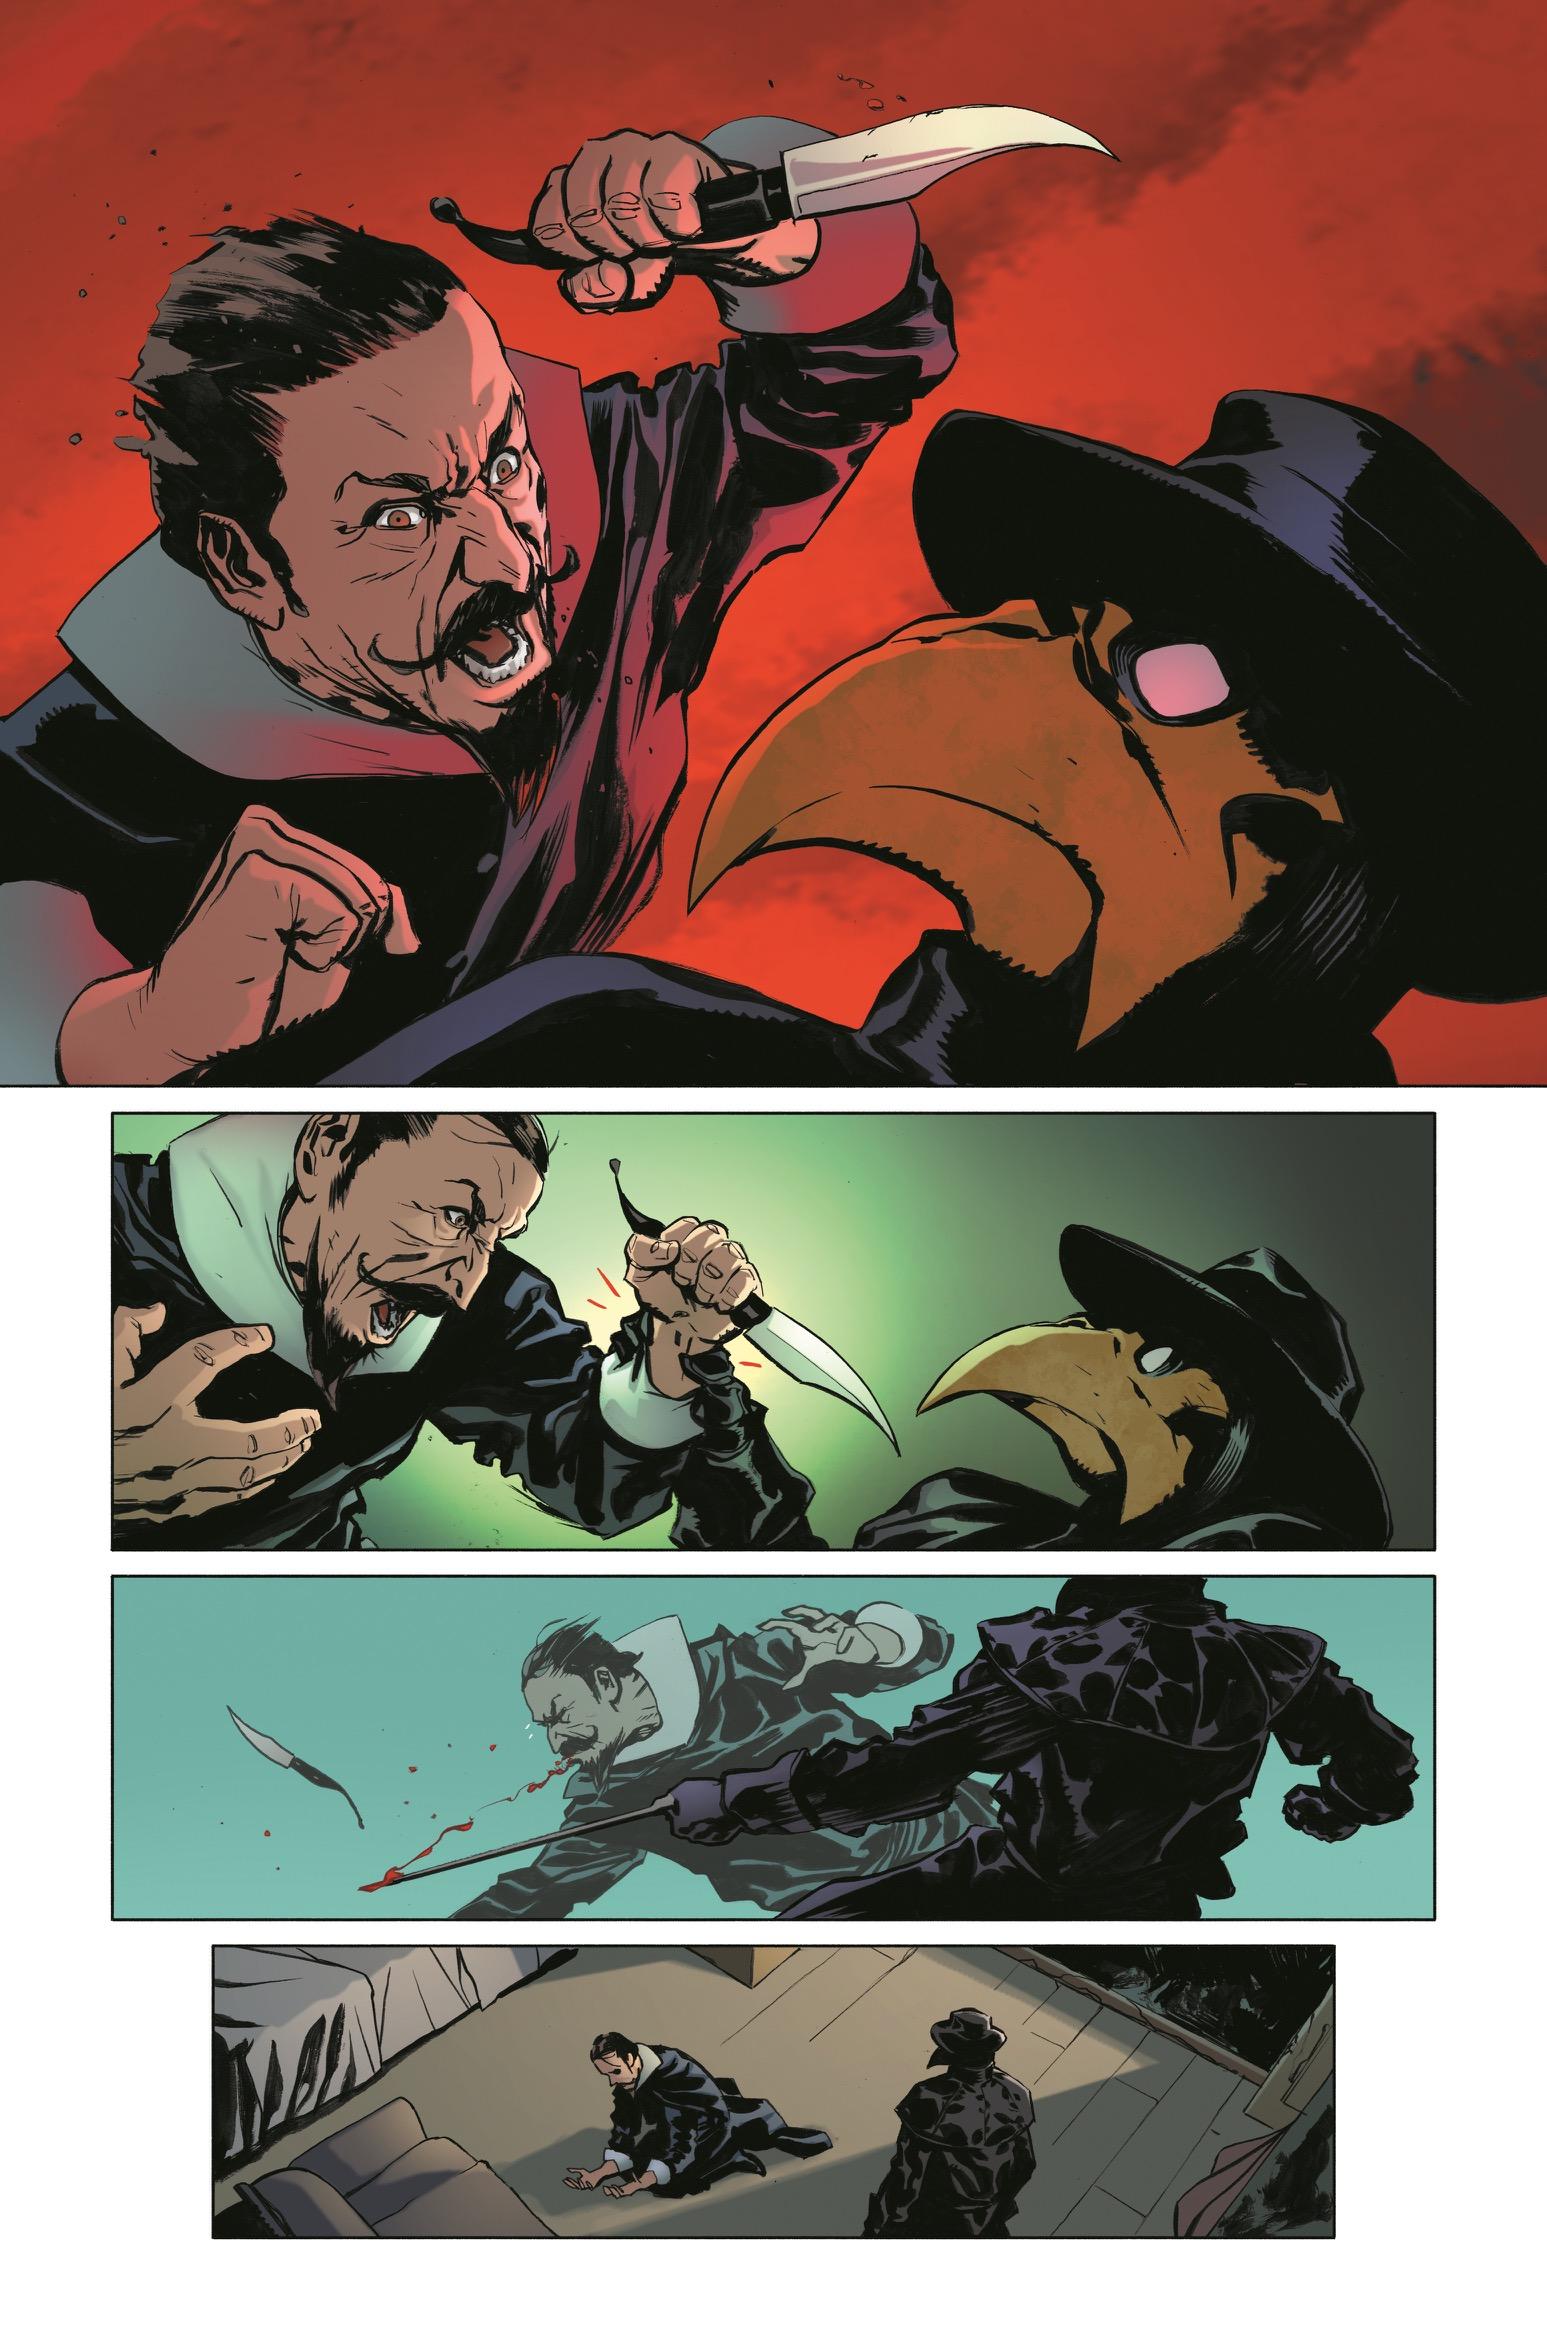 Hawkman #23 is written by Robert Venditti with art by Marcio Takara and Fernando Pasarin.